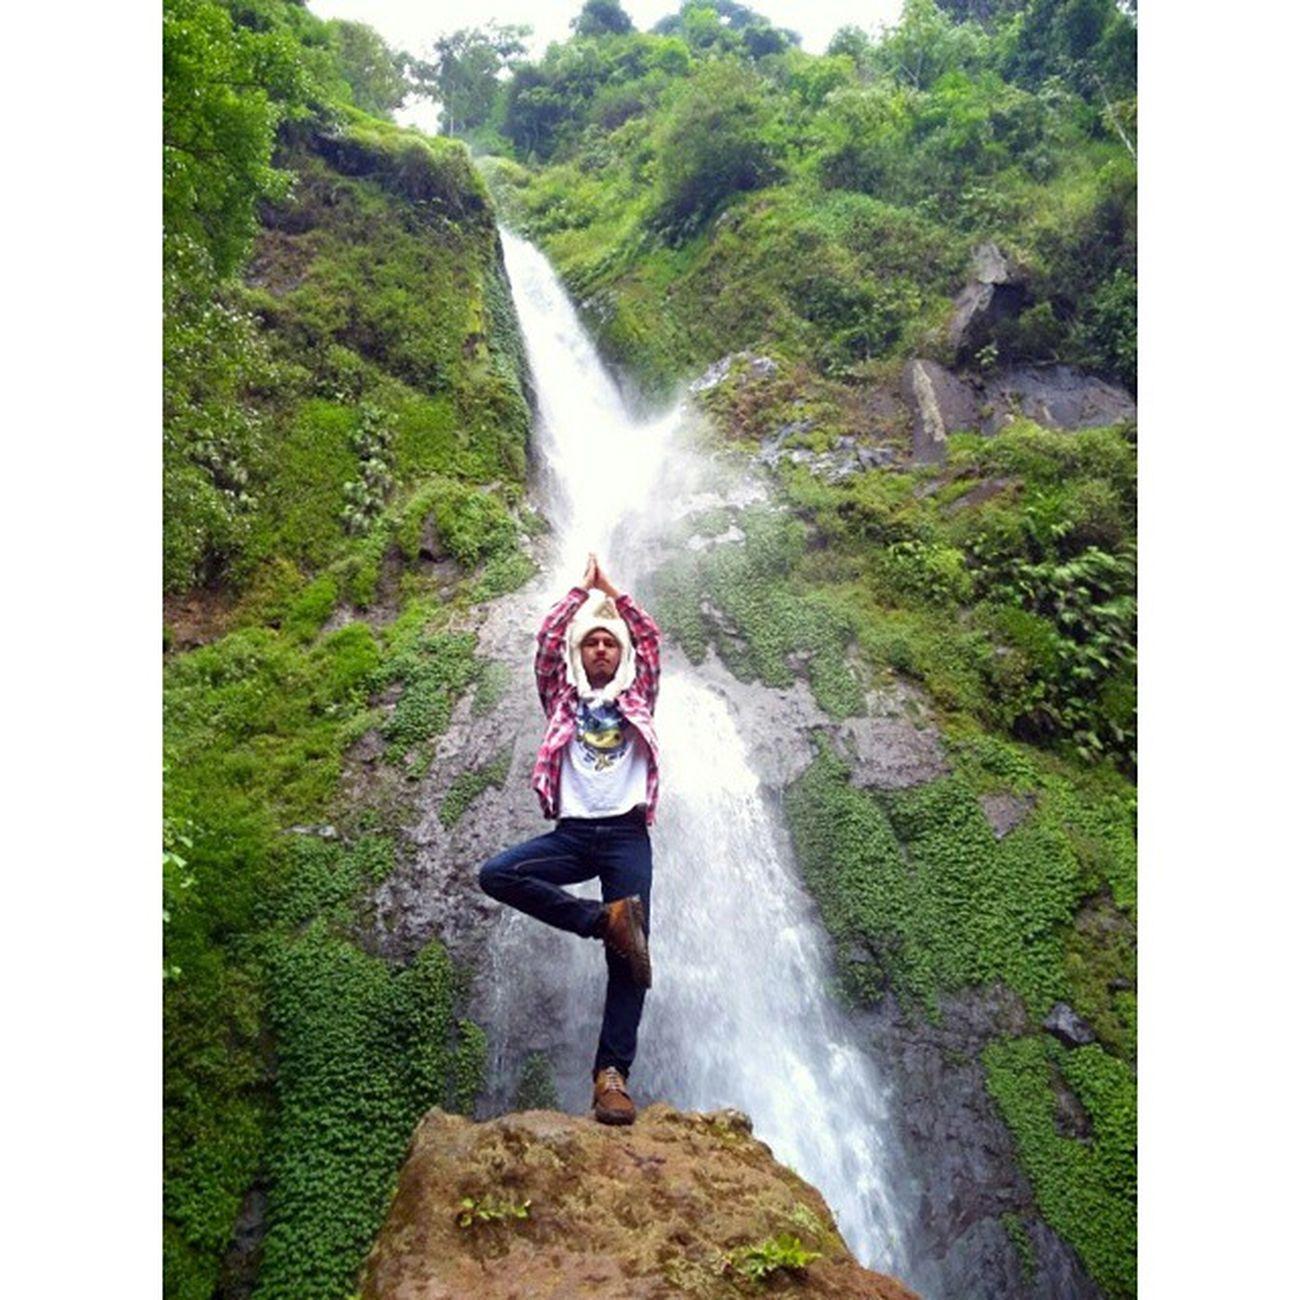 Namaste! Ridwanderful JarambahBandung DiBawahLangitBandung BandungIsMe